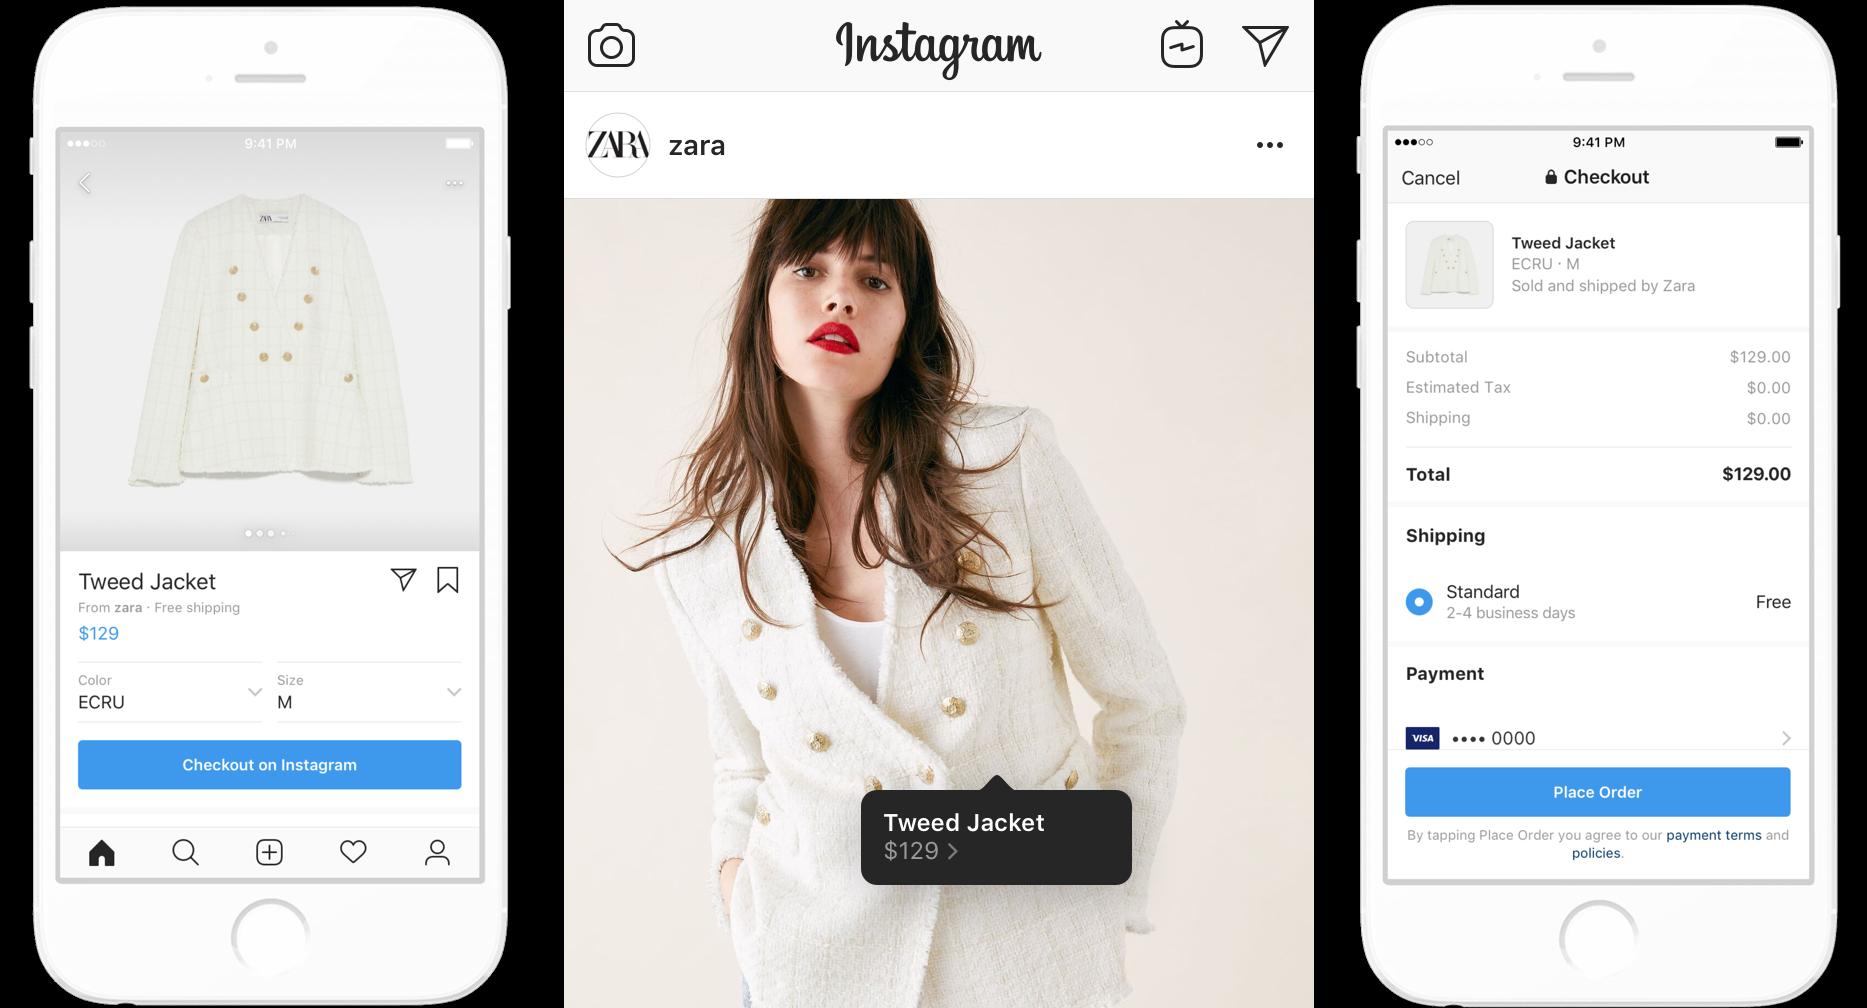 instagram-shopping-capabilities